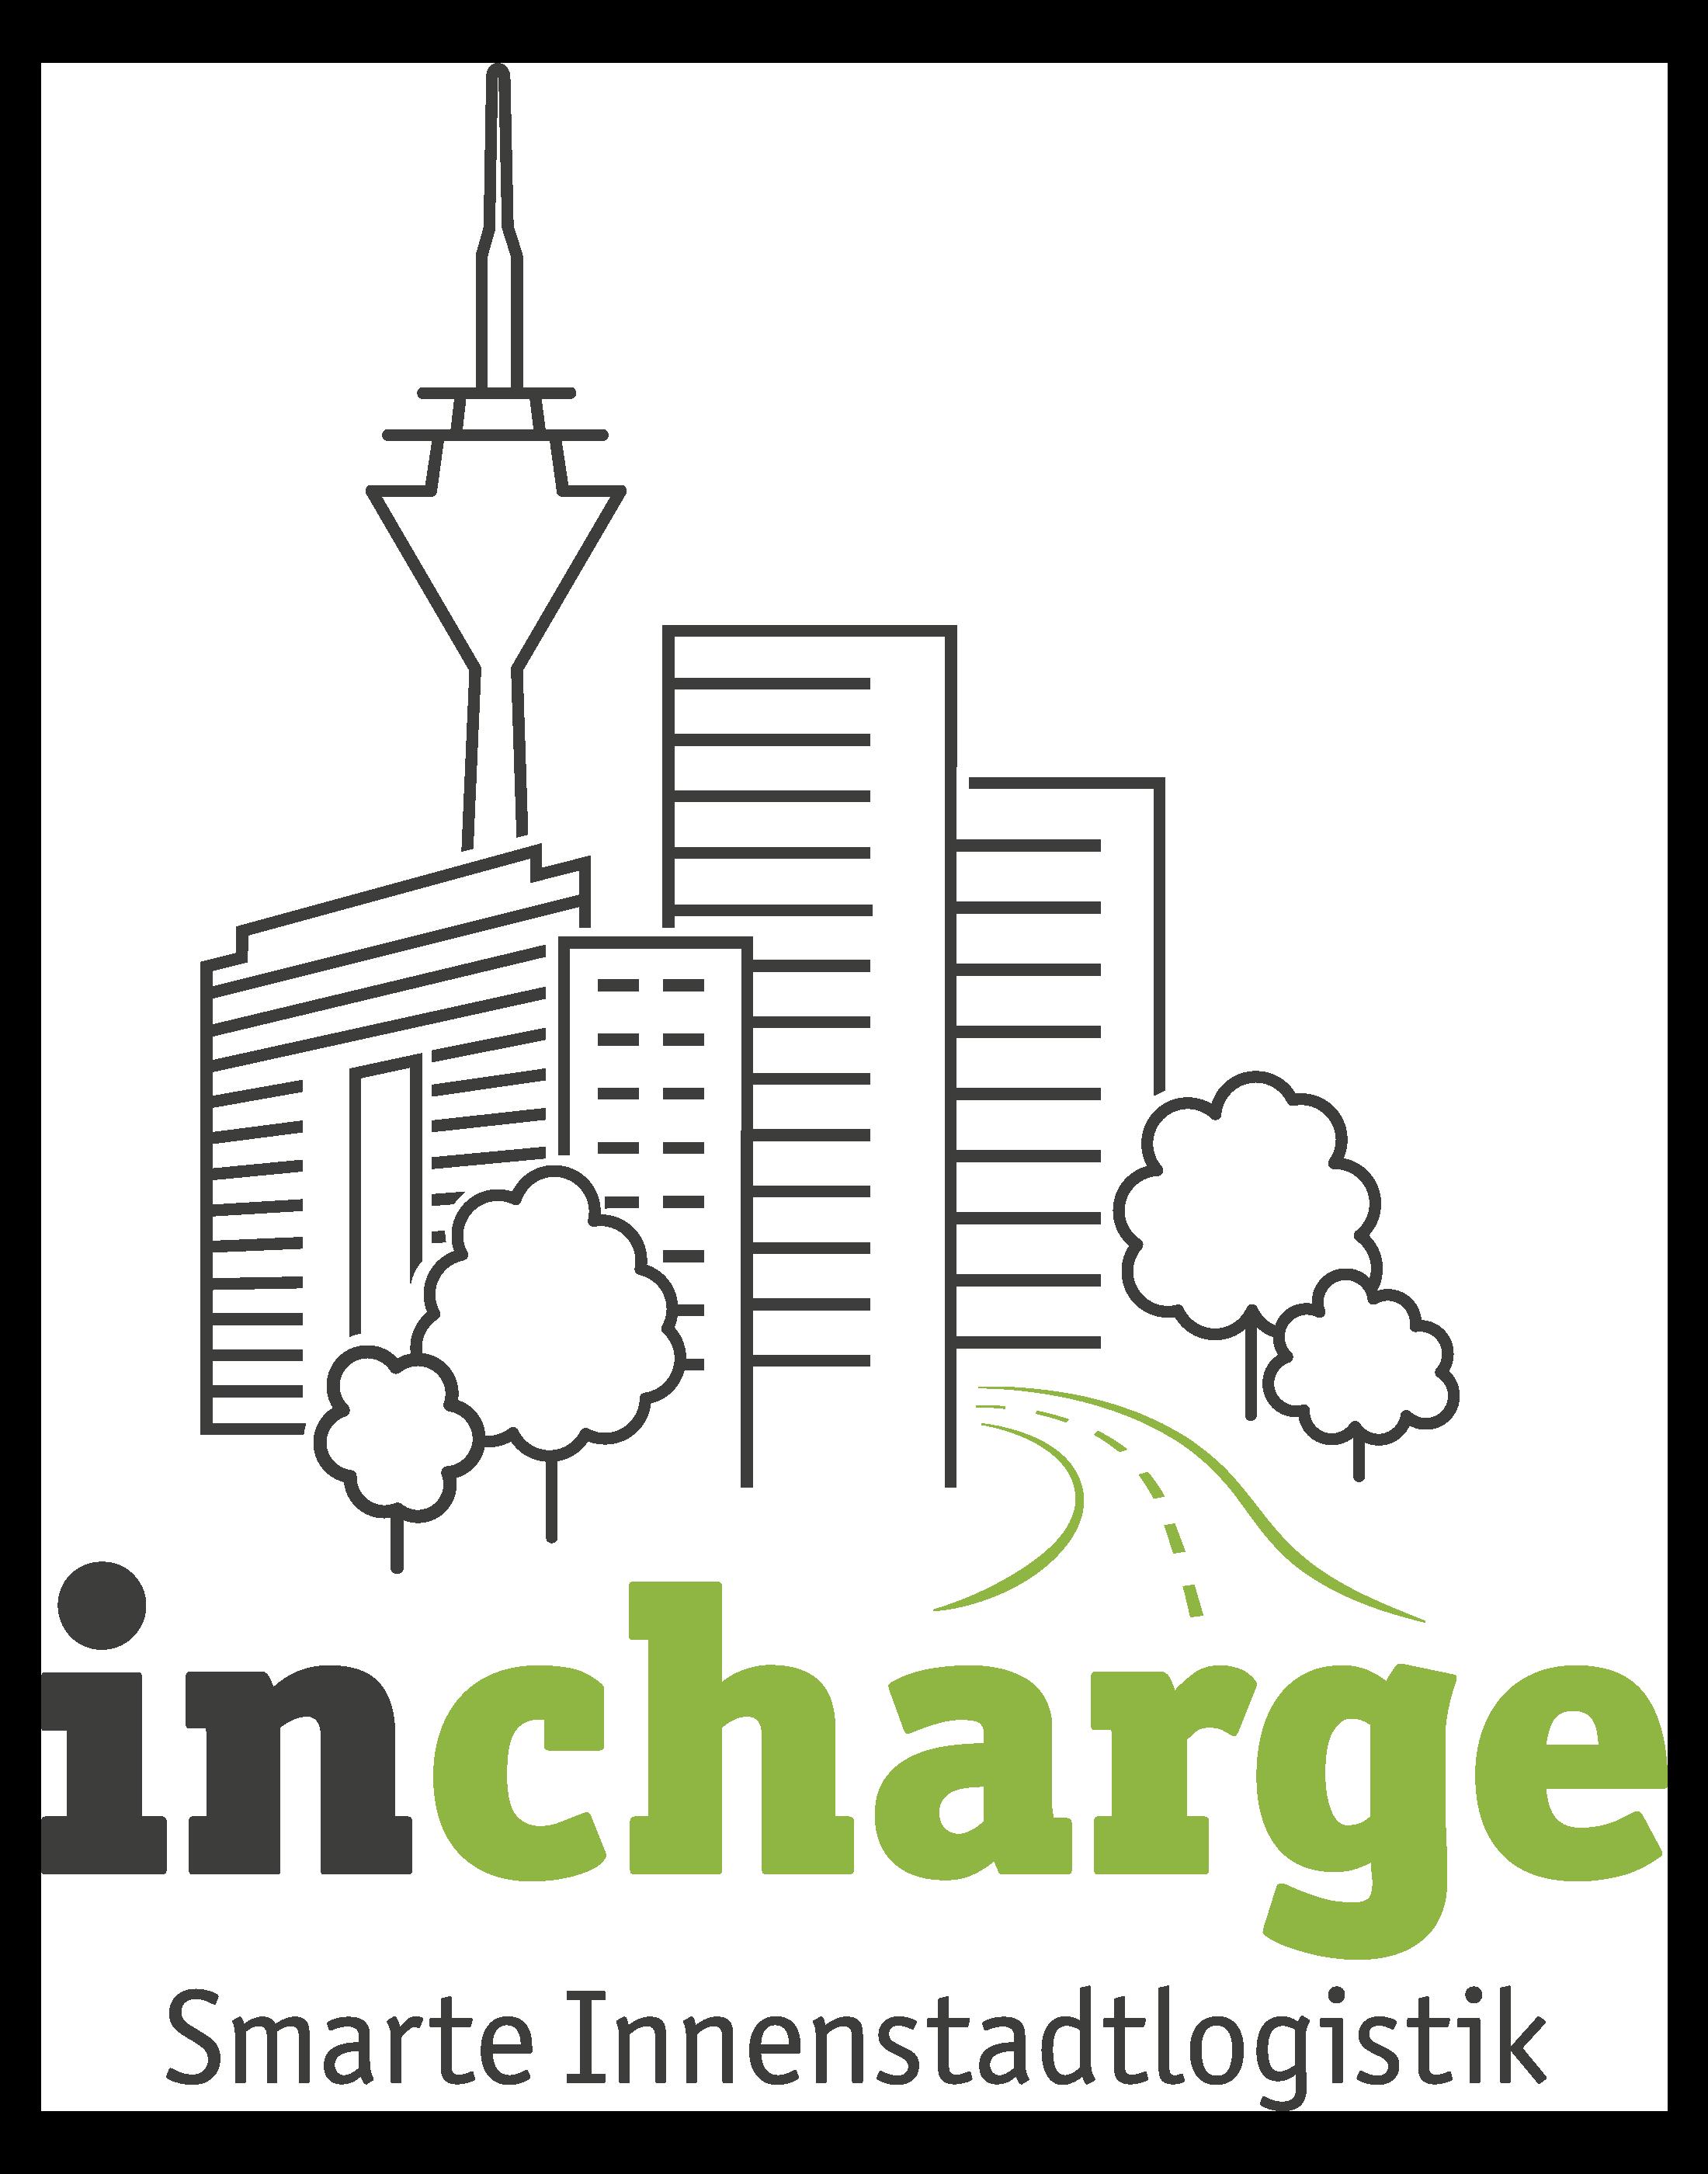 Logo incharge - Smarte Innenstadtlogistik